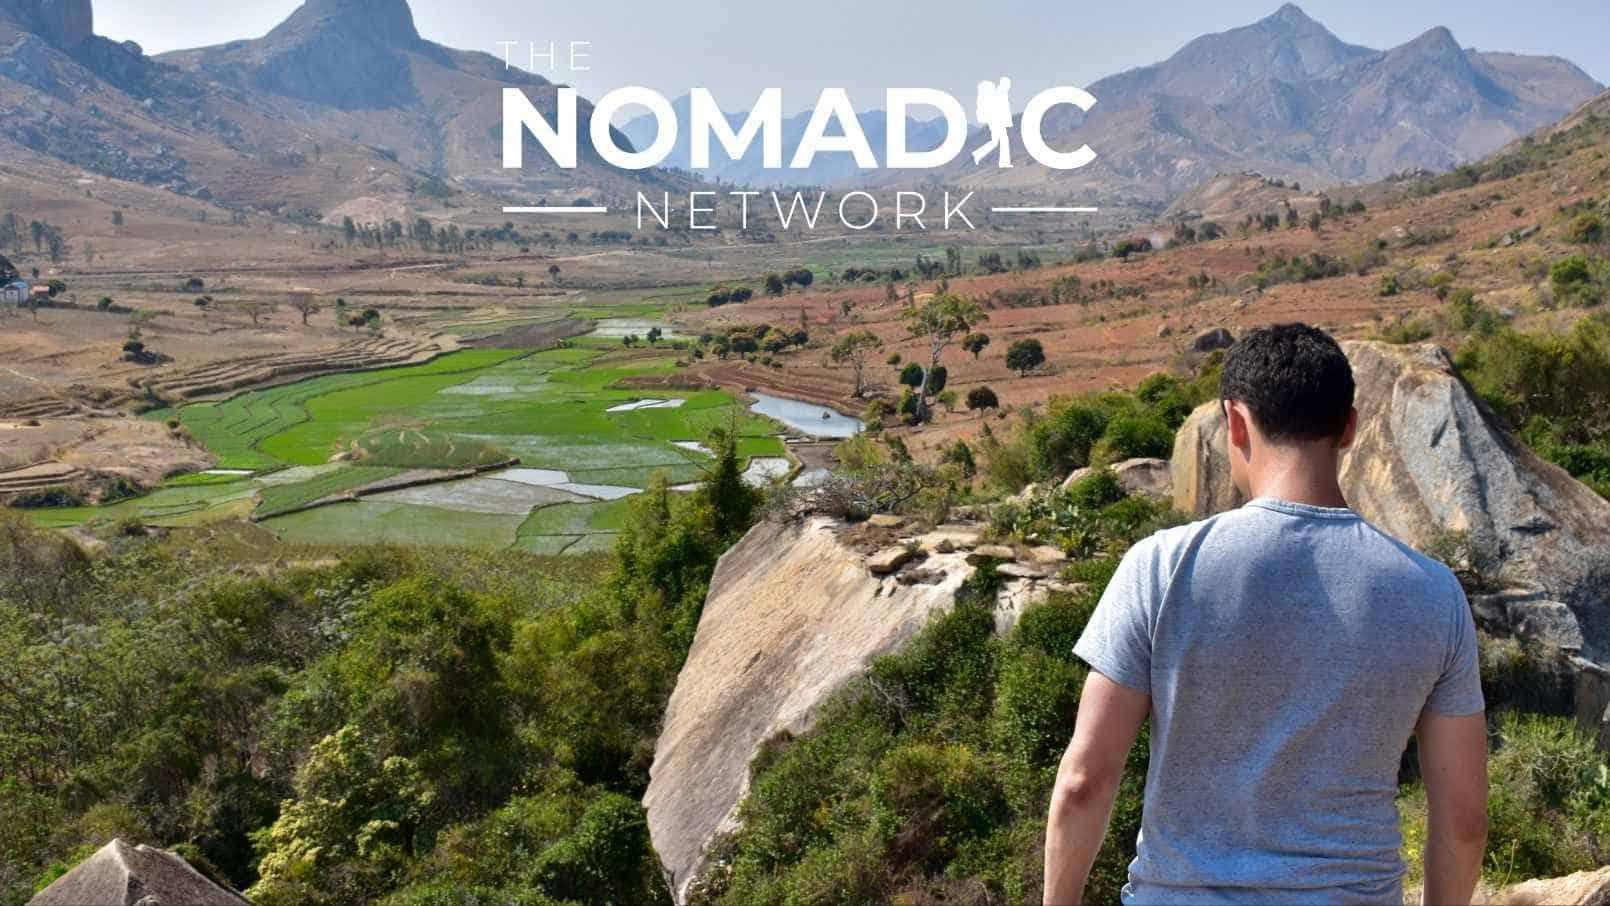 Nomadic Matt posing in Africa